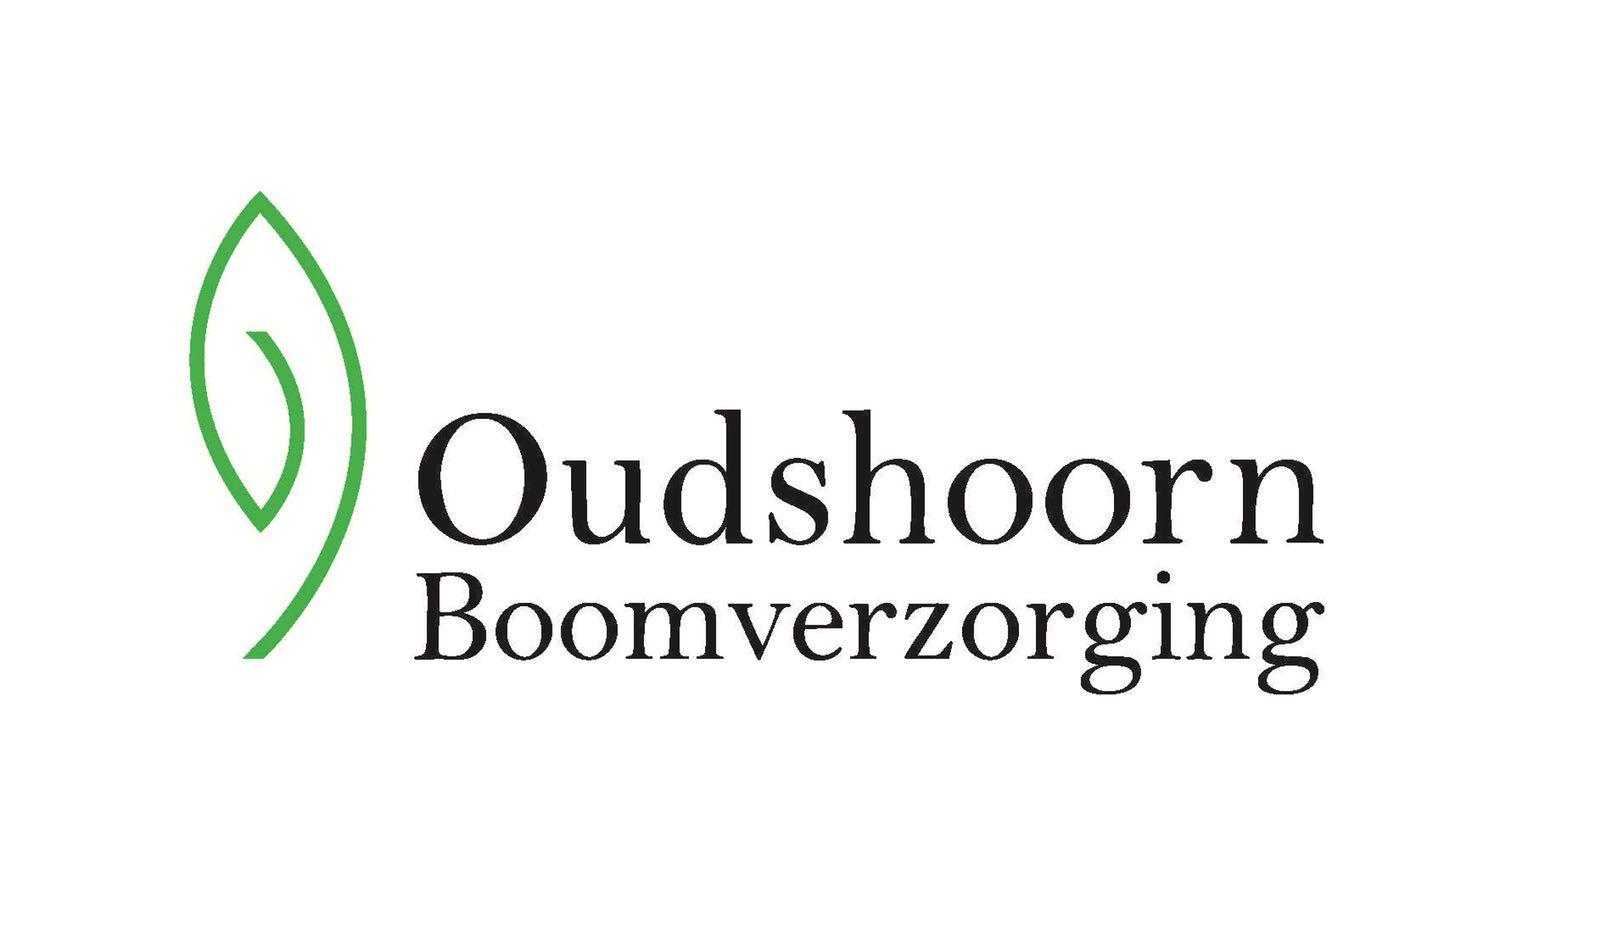 Oudshoorn Boomverzorging